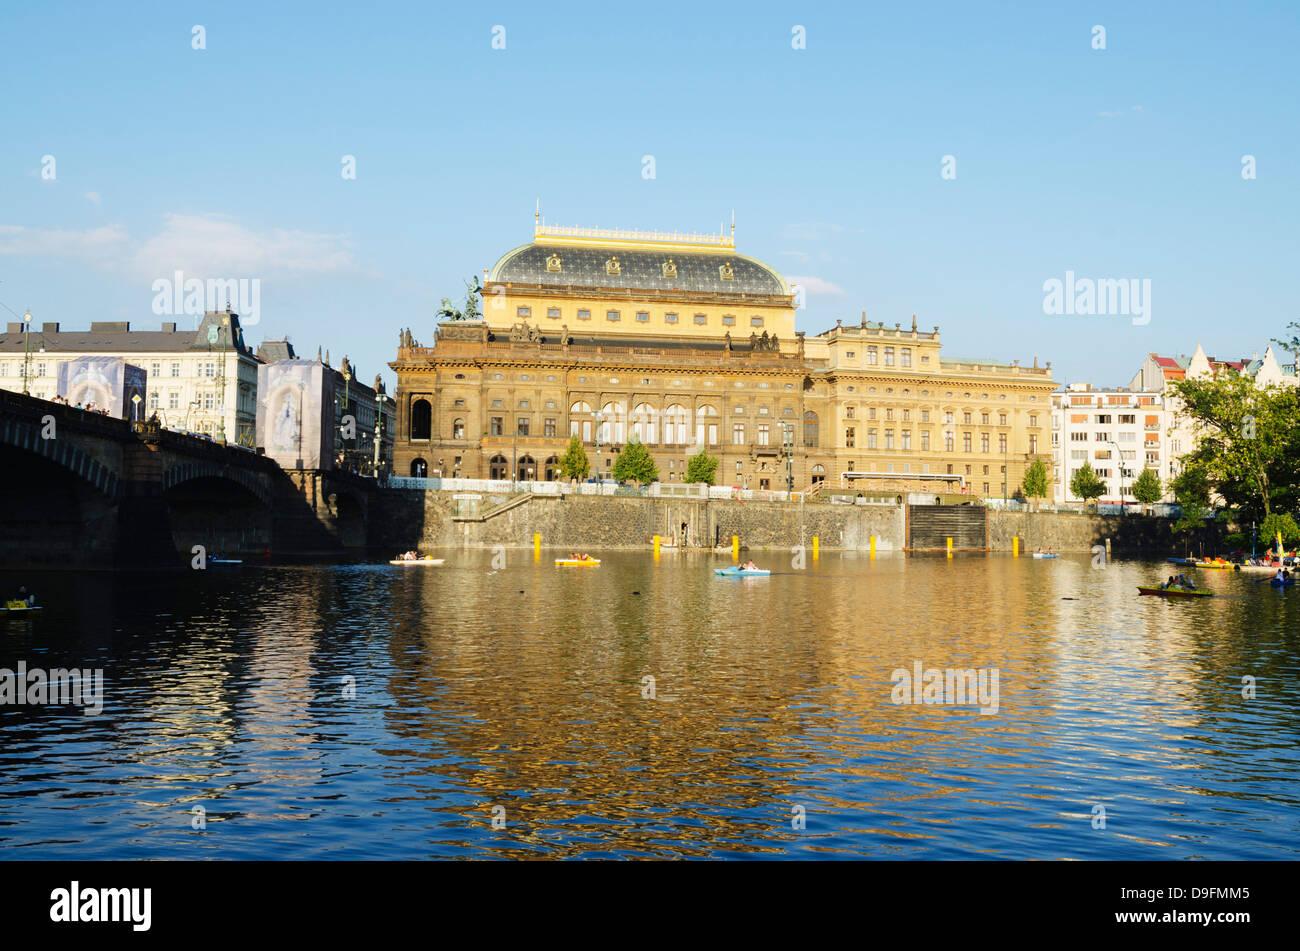 National Theatre, UNESCO World Heritage Site, Prague, Czech Republic - Stock Image